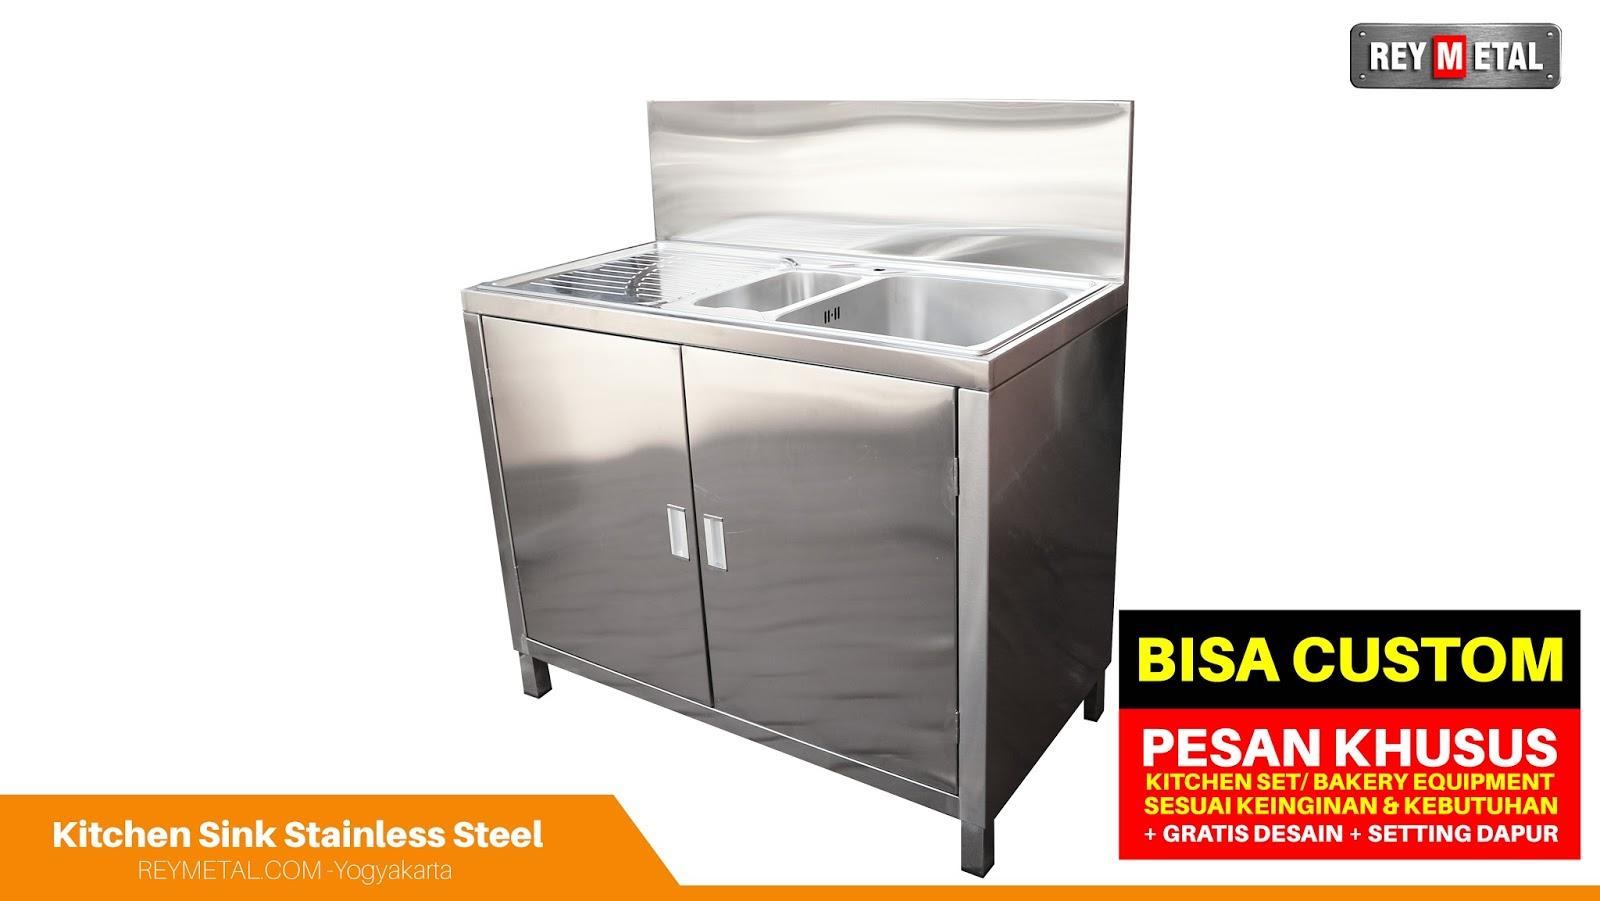 harga+kitchen+sink+stainless+steel.jpg